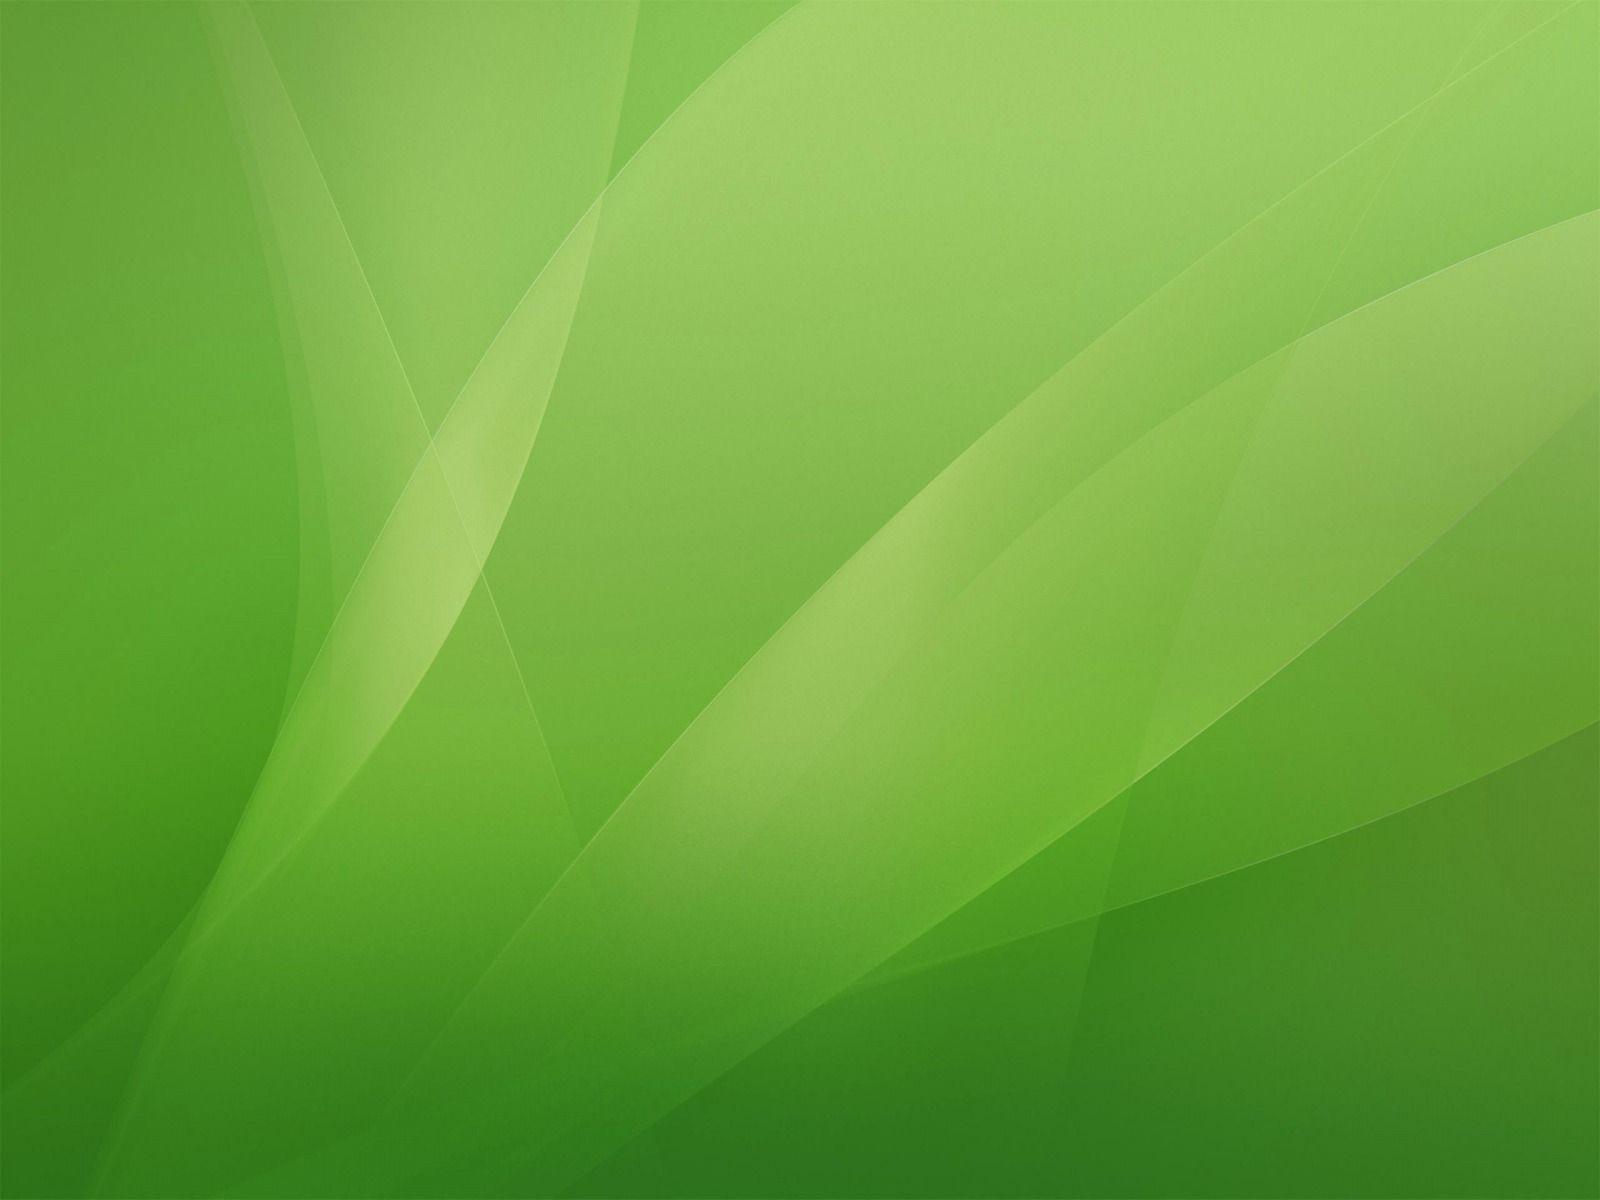 green Green Texture backgrounds Green Texture powerpoint free